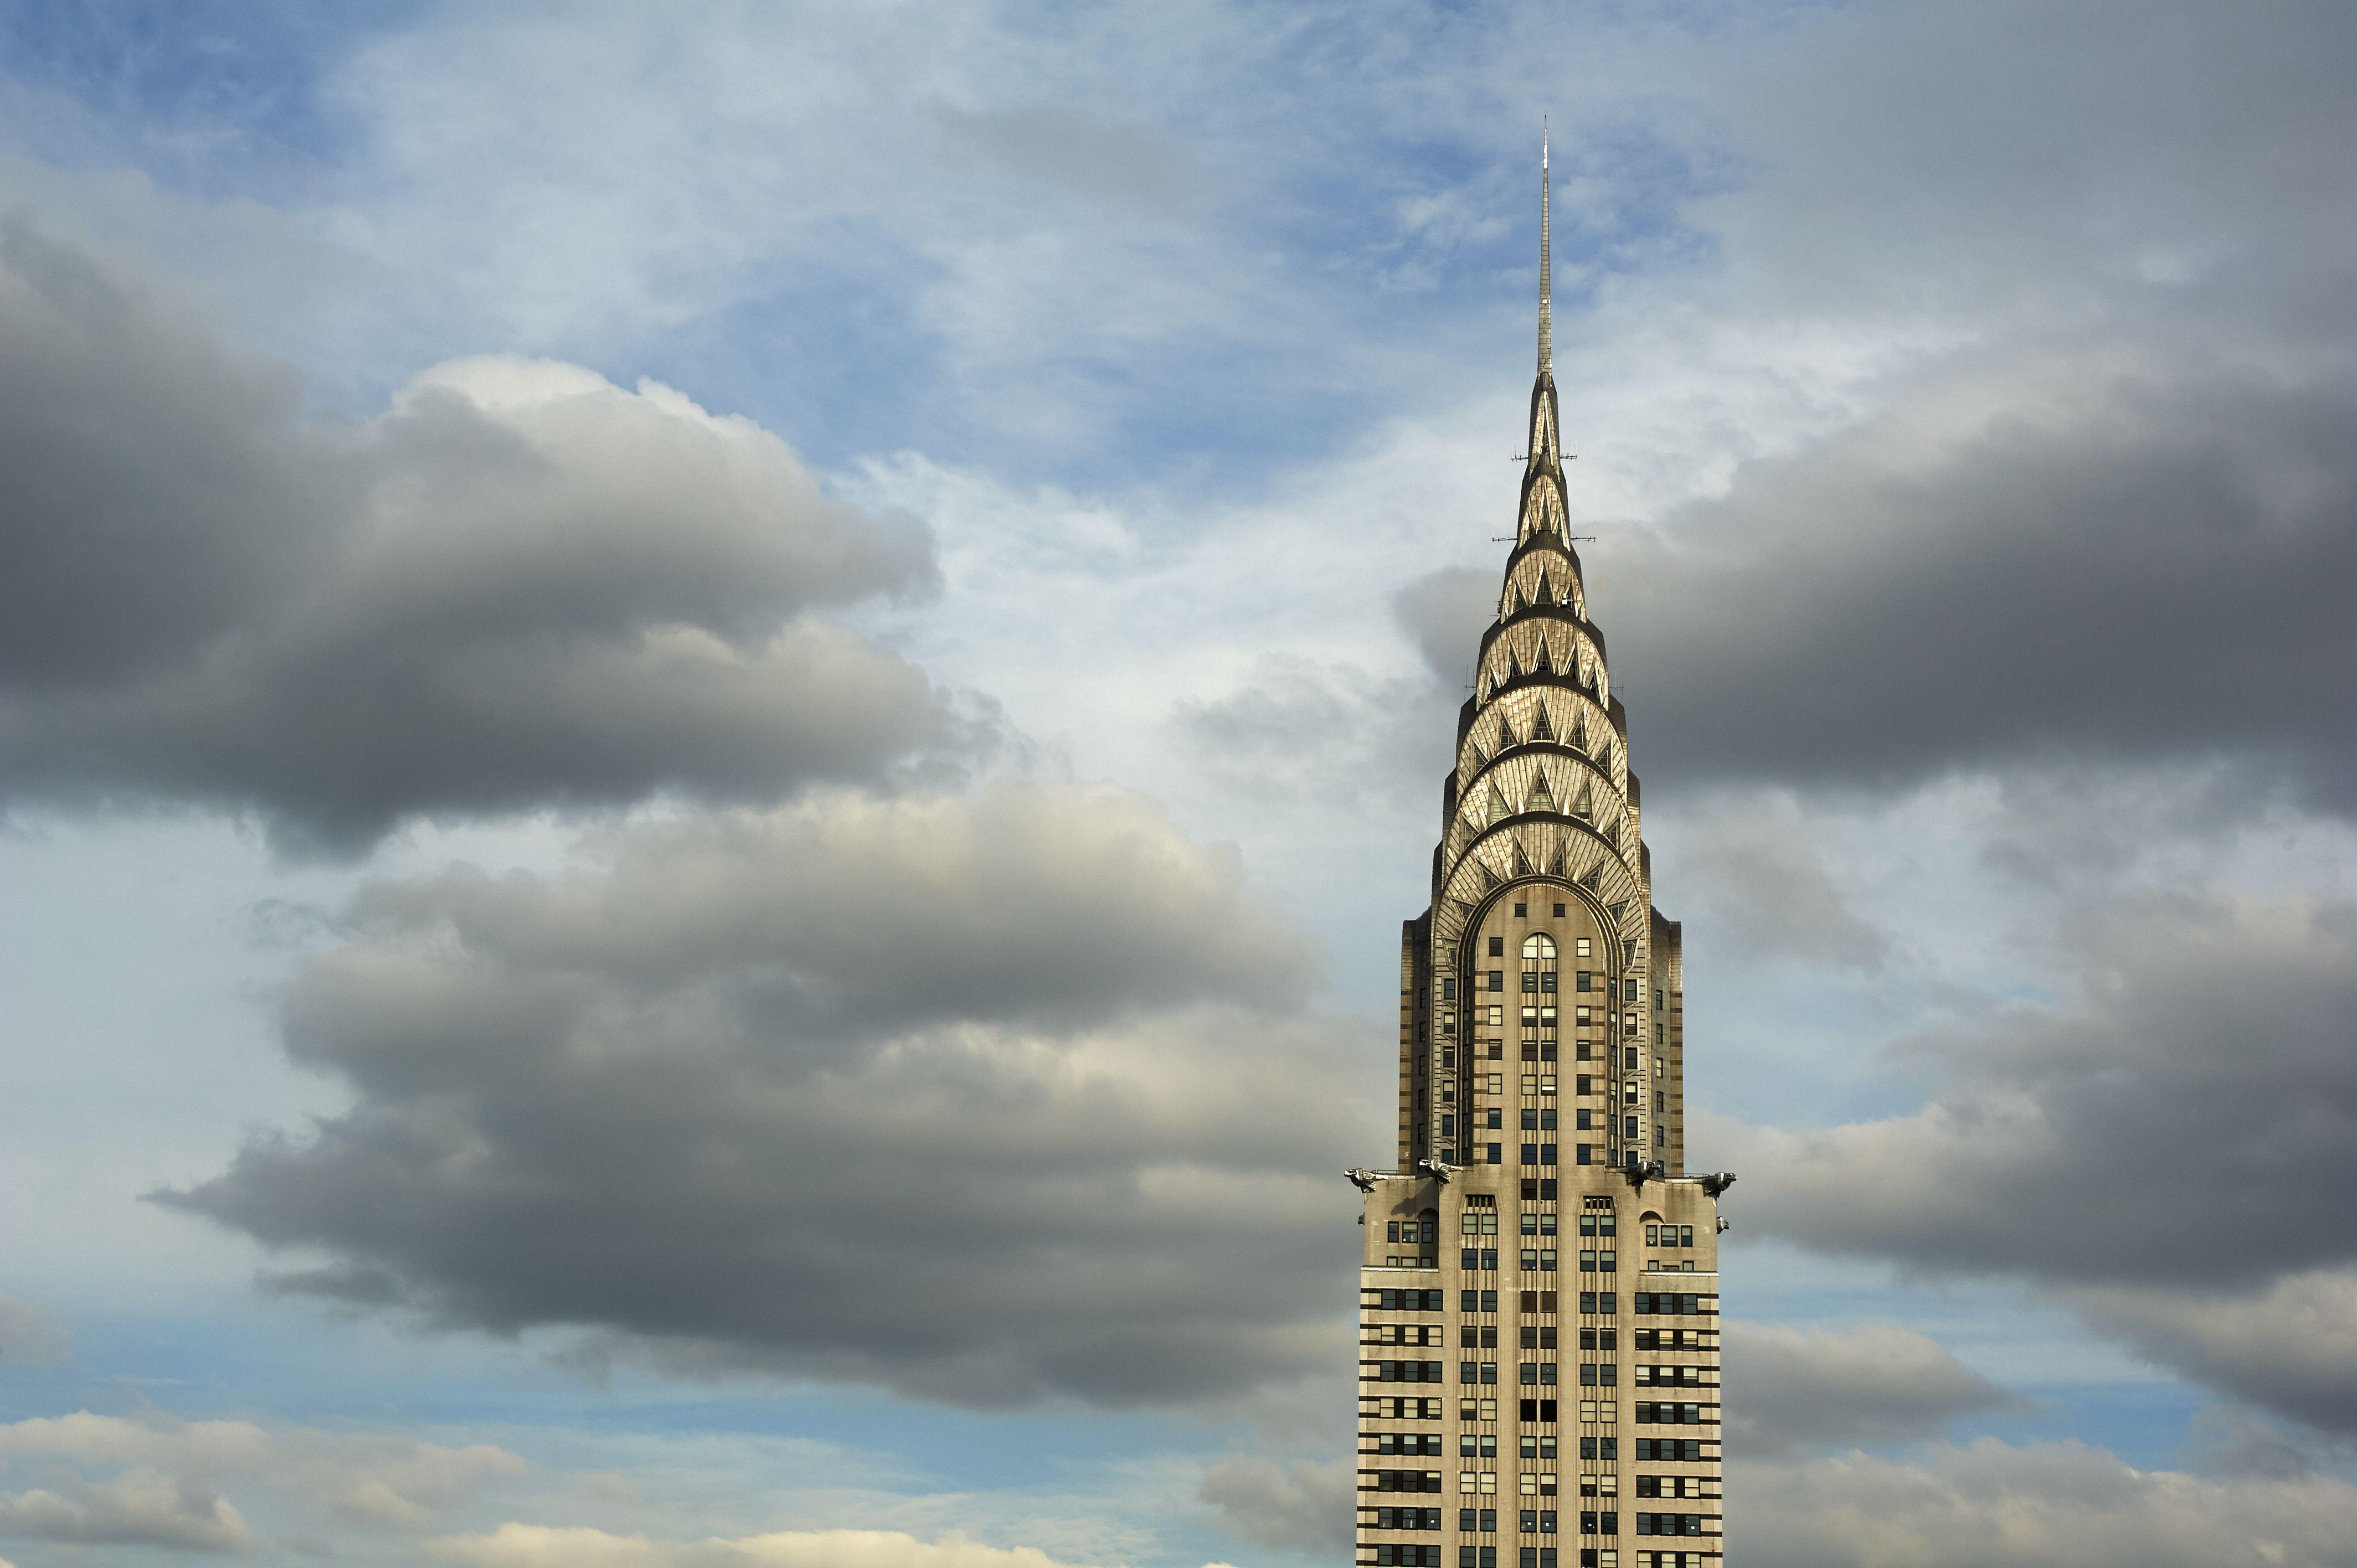 The Chrysler Building, Manhattan